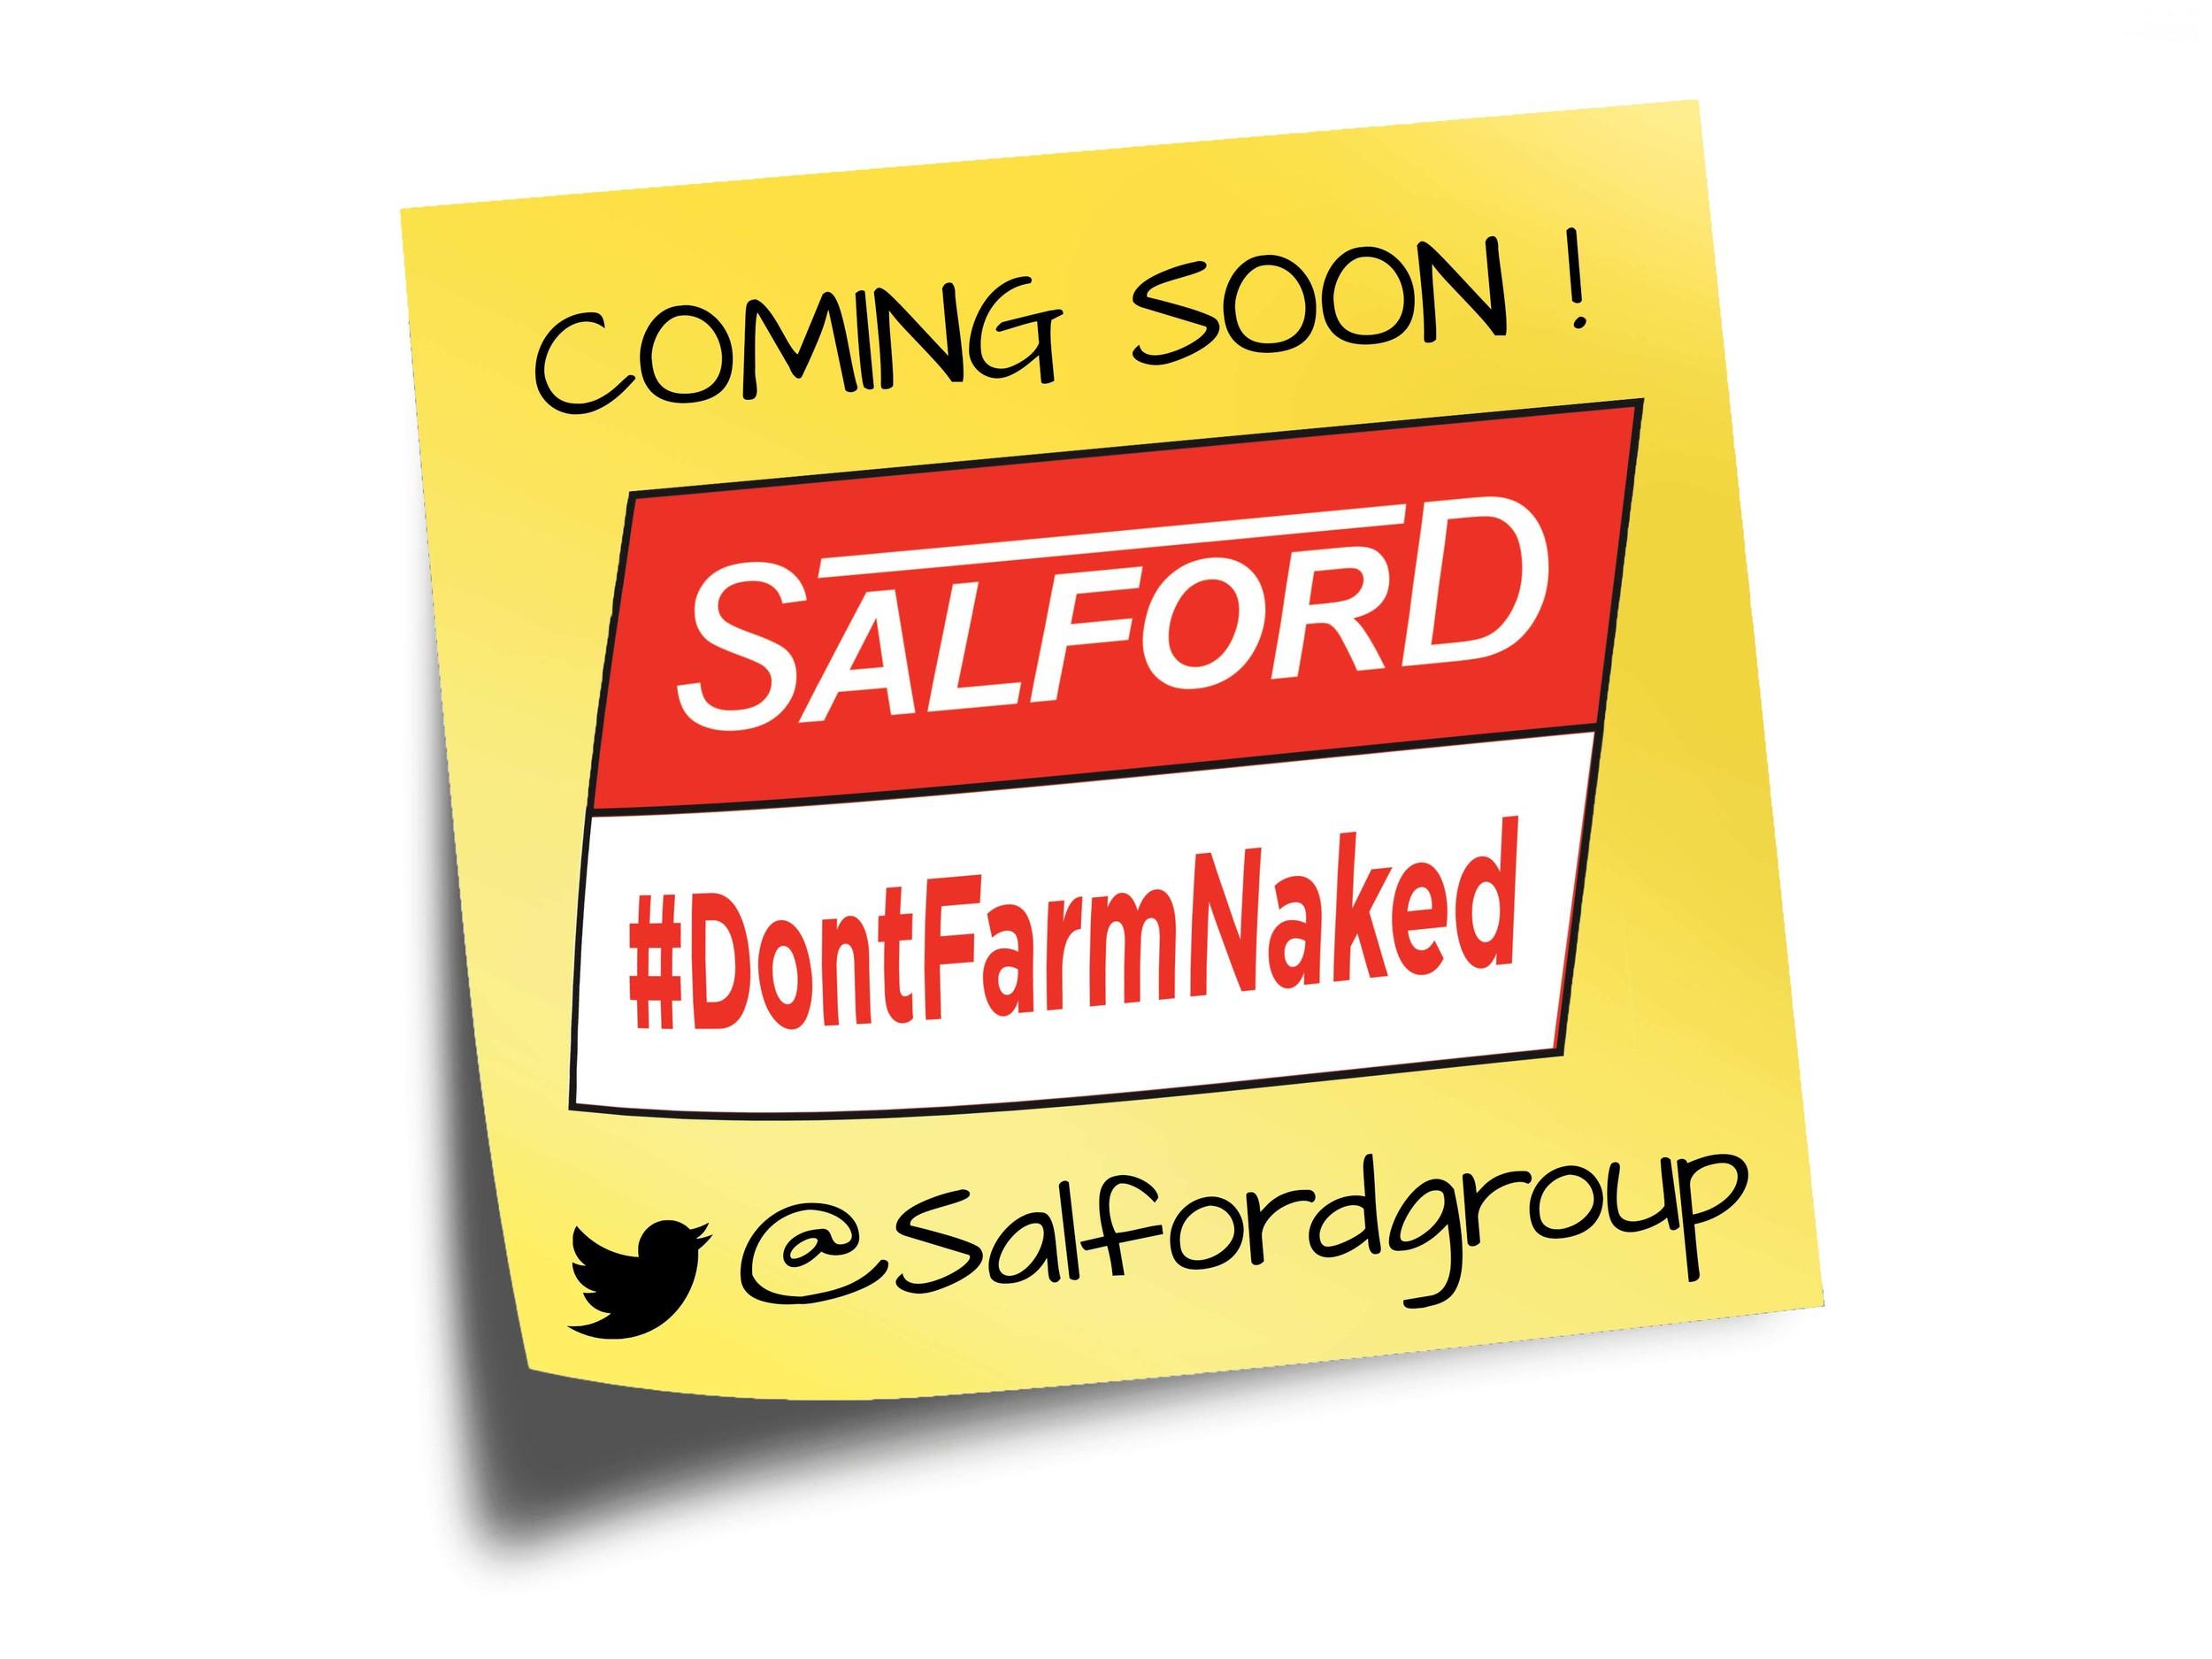 Salford #DontFarmnaked